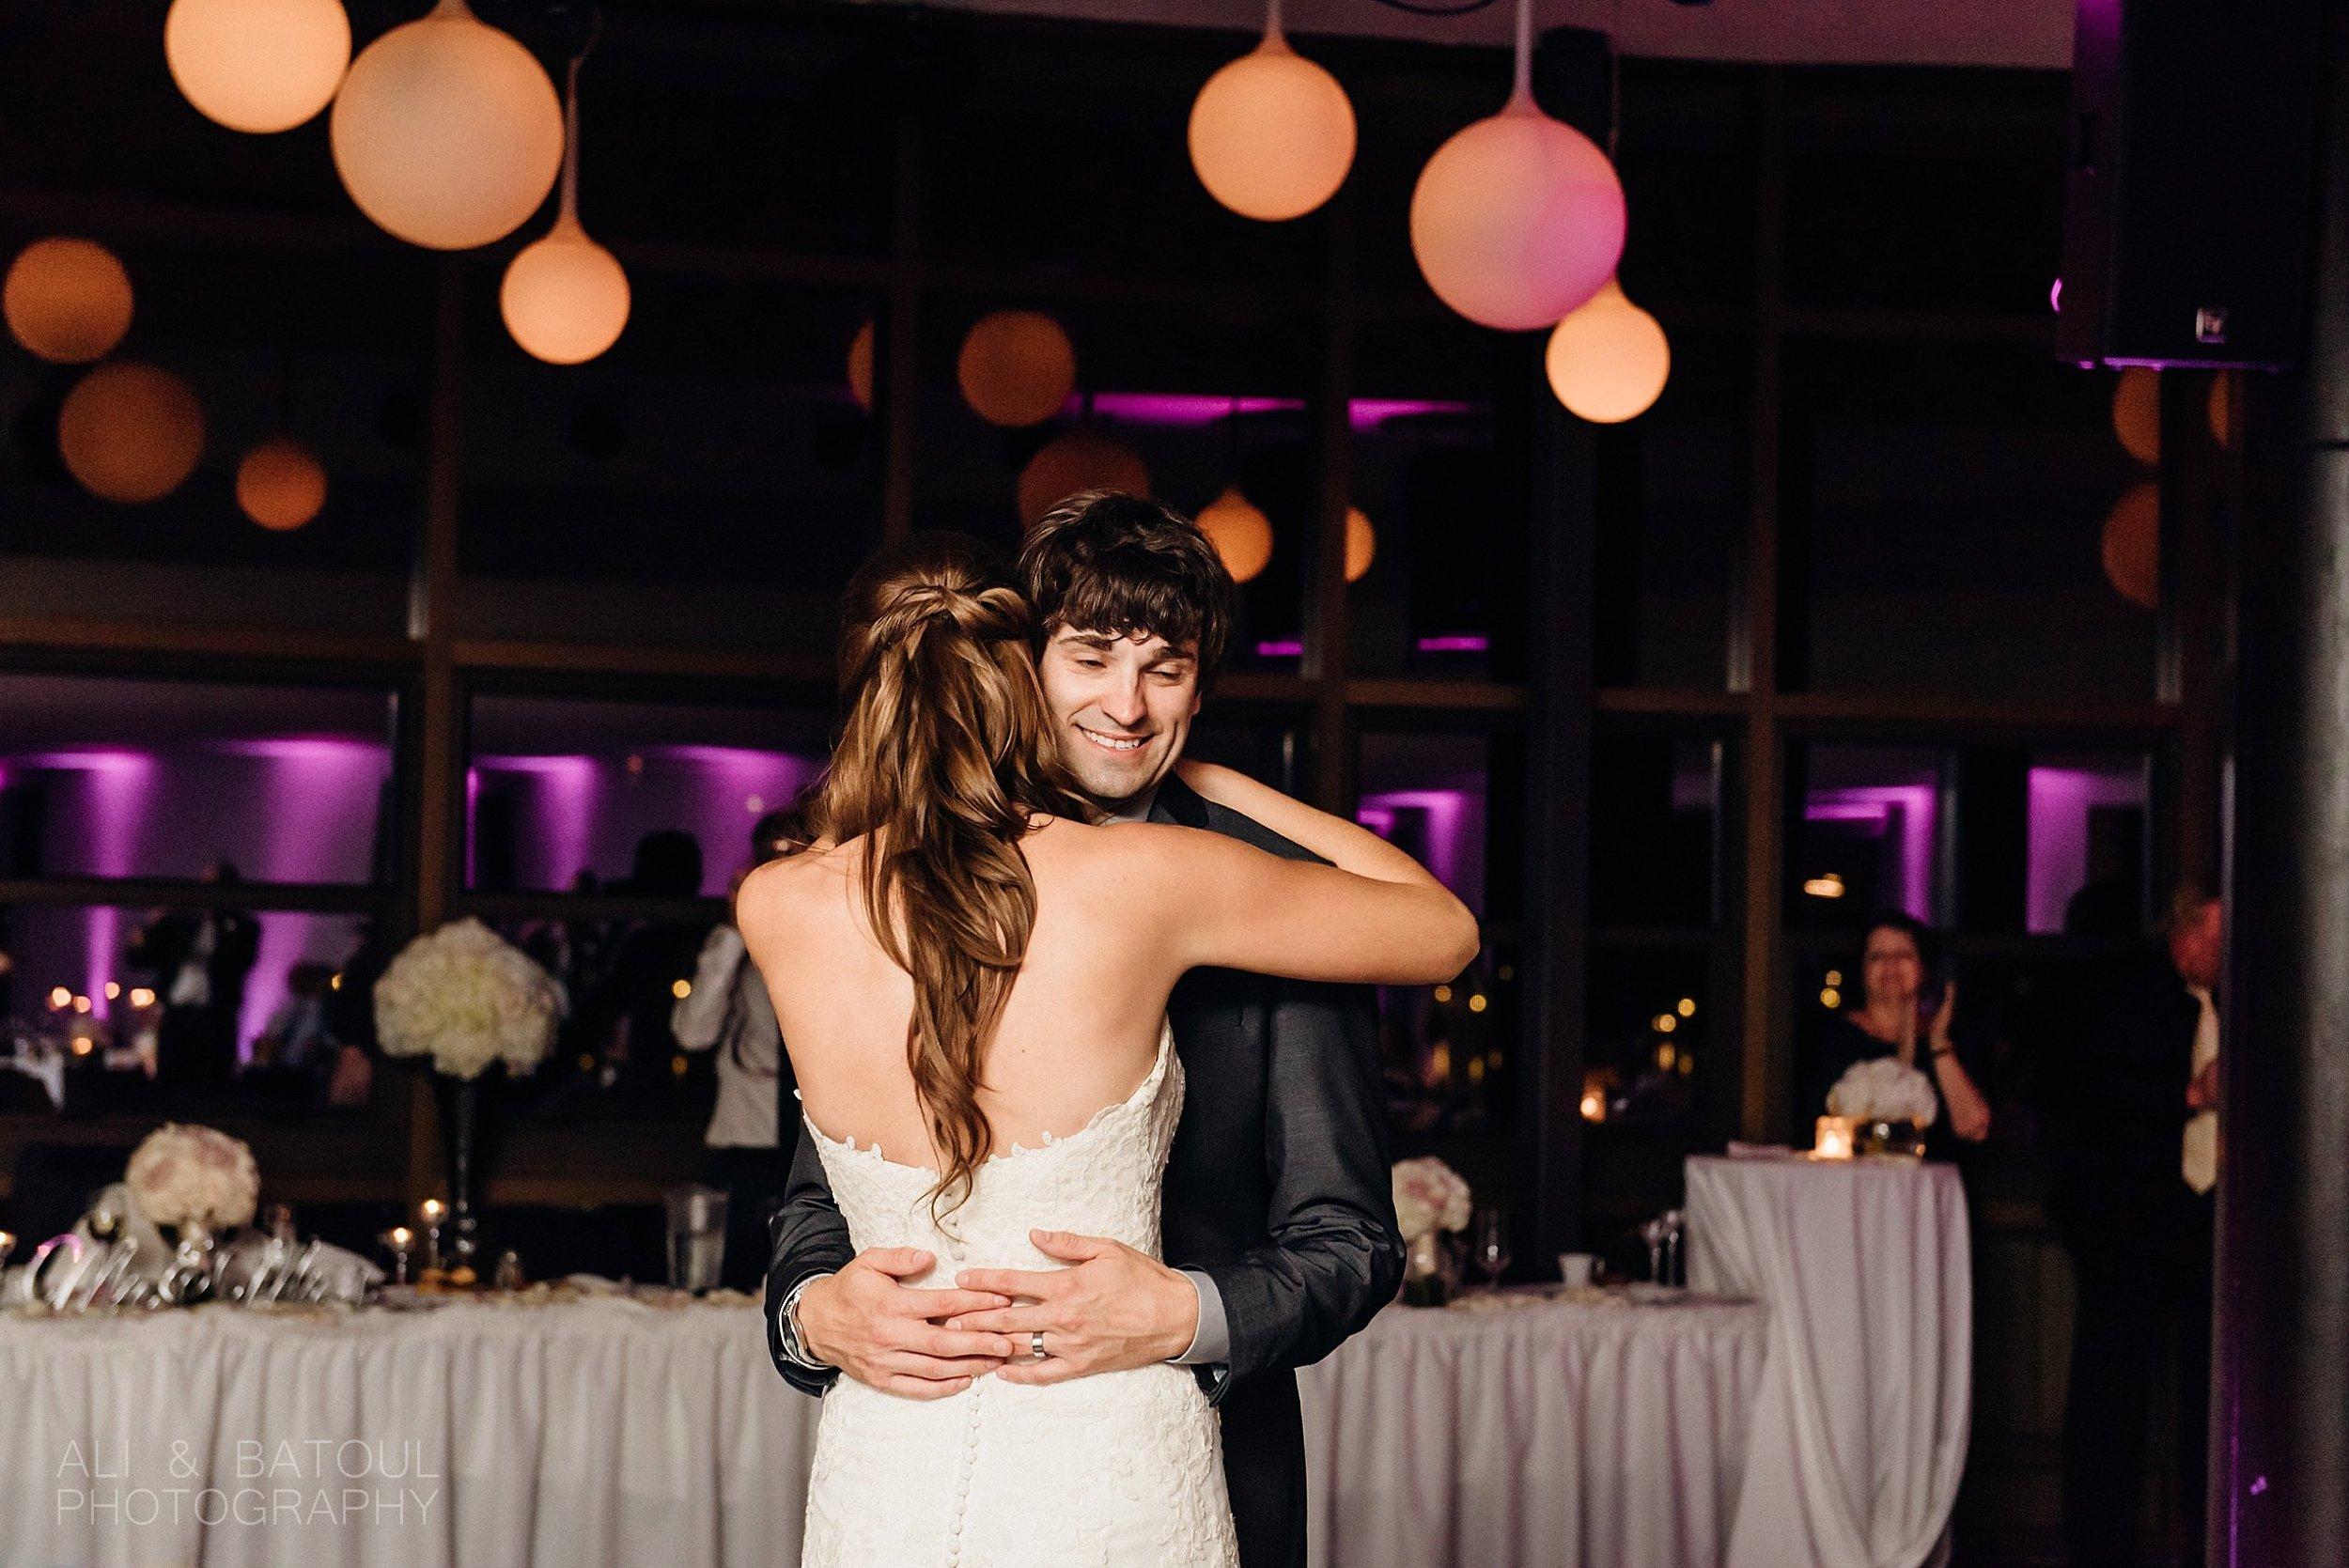 Ali & Batoul Photography - Documentary Fine Art Ottawa Wedding Photography_0094.jpg